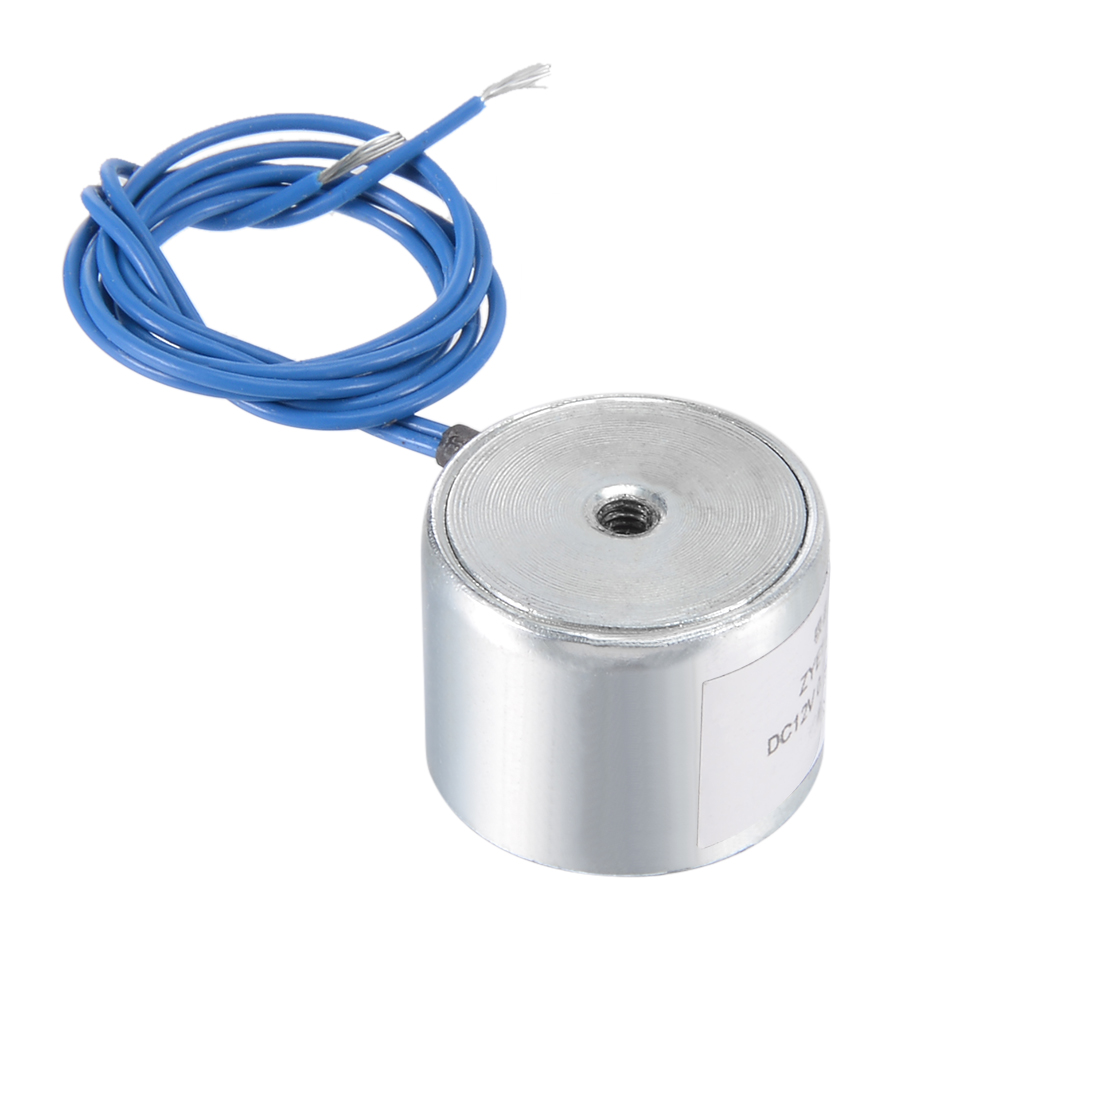 20mm x 15mm DC12V 0.25A 25N Sucking Disc Solenoid Lift Holding Electromagnet